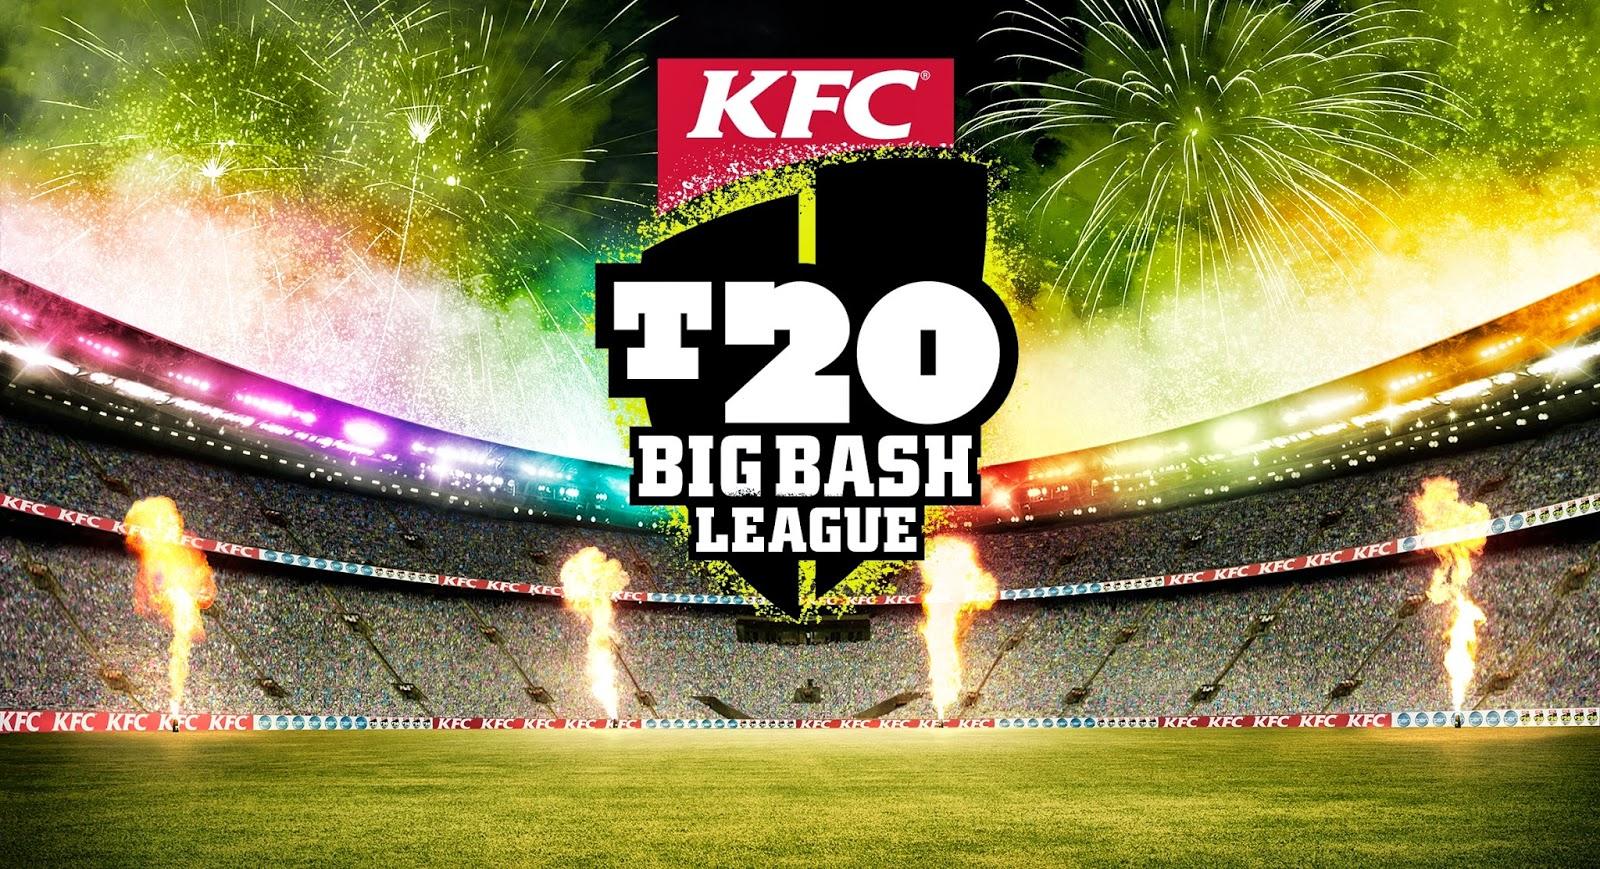 KFC-Big-Bash-2014-2015-Twenty20-Cricket